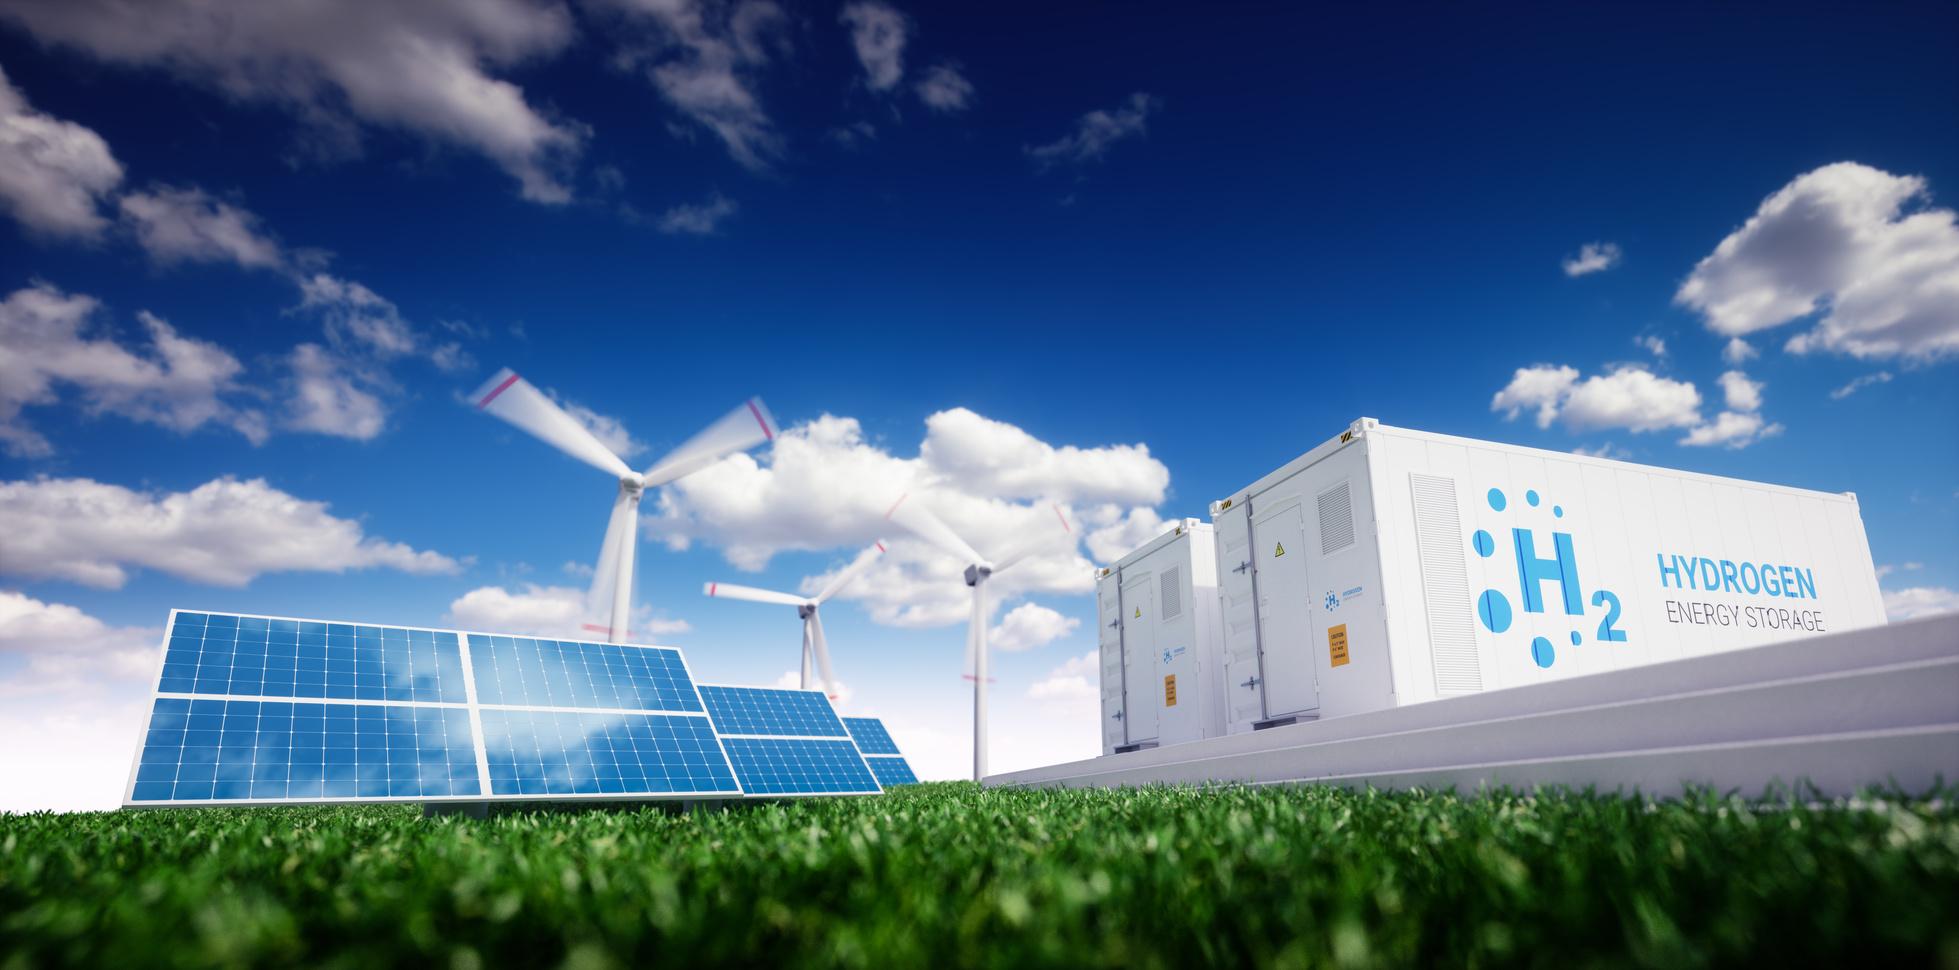 Fuel Cells Works, Endesa, Hydrogen Plant, Spain, News